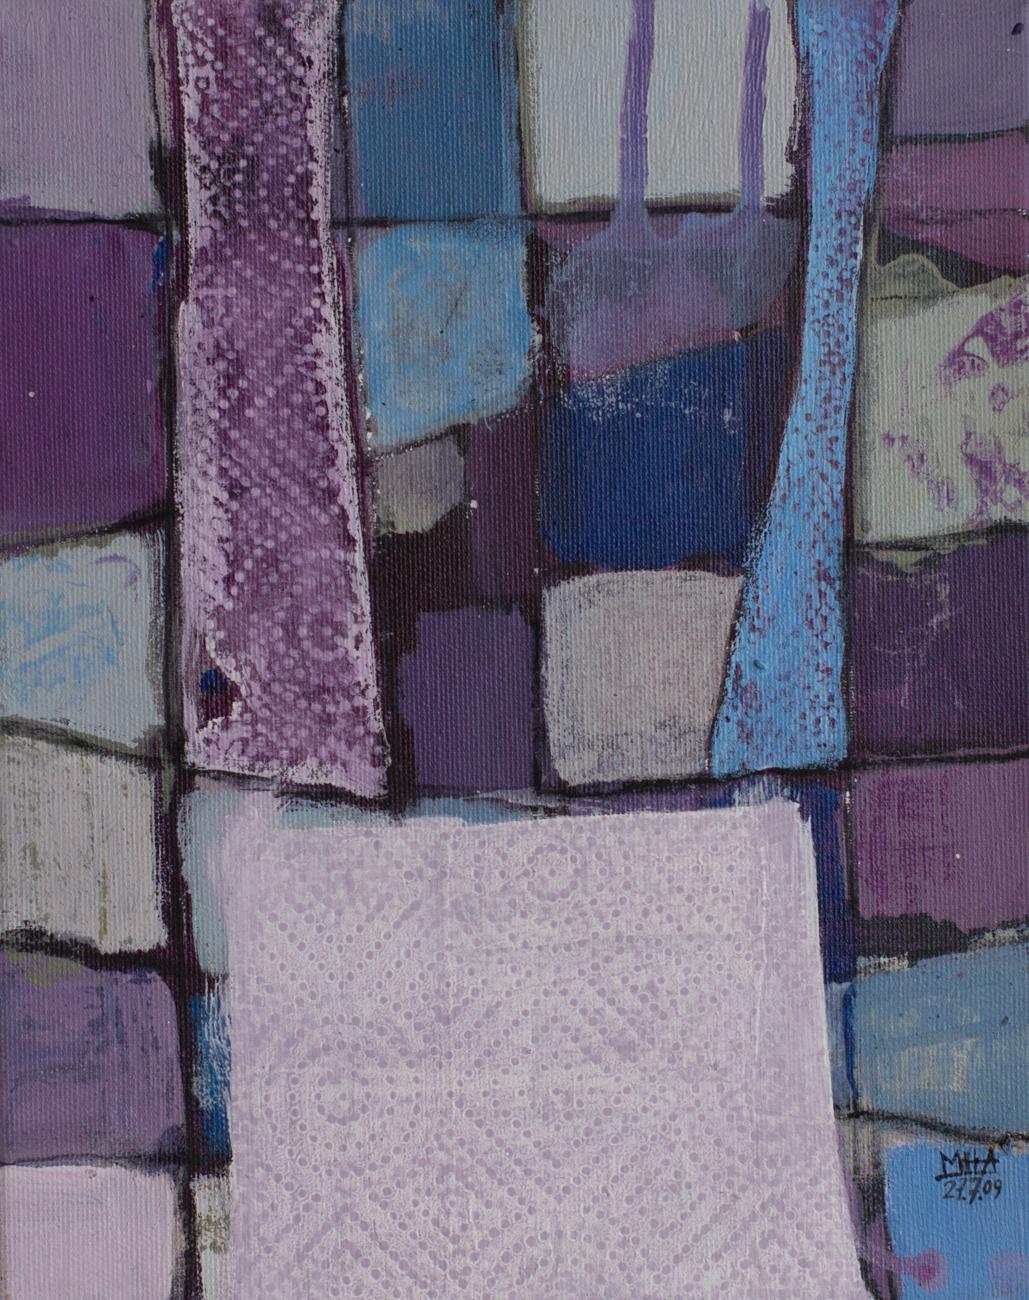 Fantasie in Linien 19 , 2009,Acryl auf Leinwand, 24x30 cm